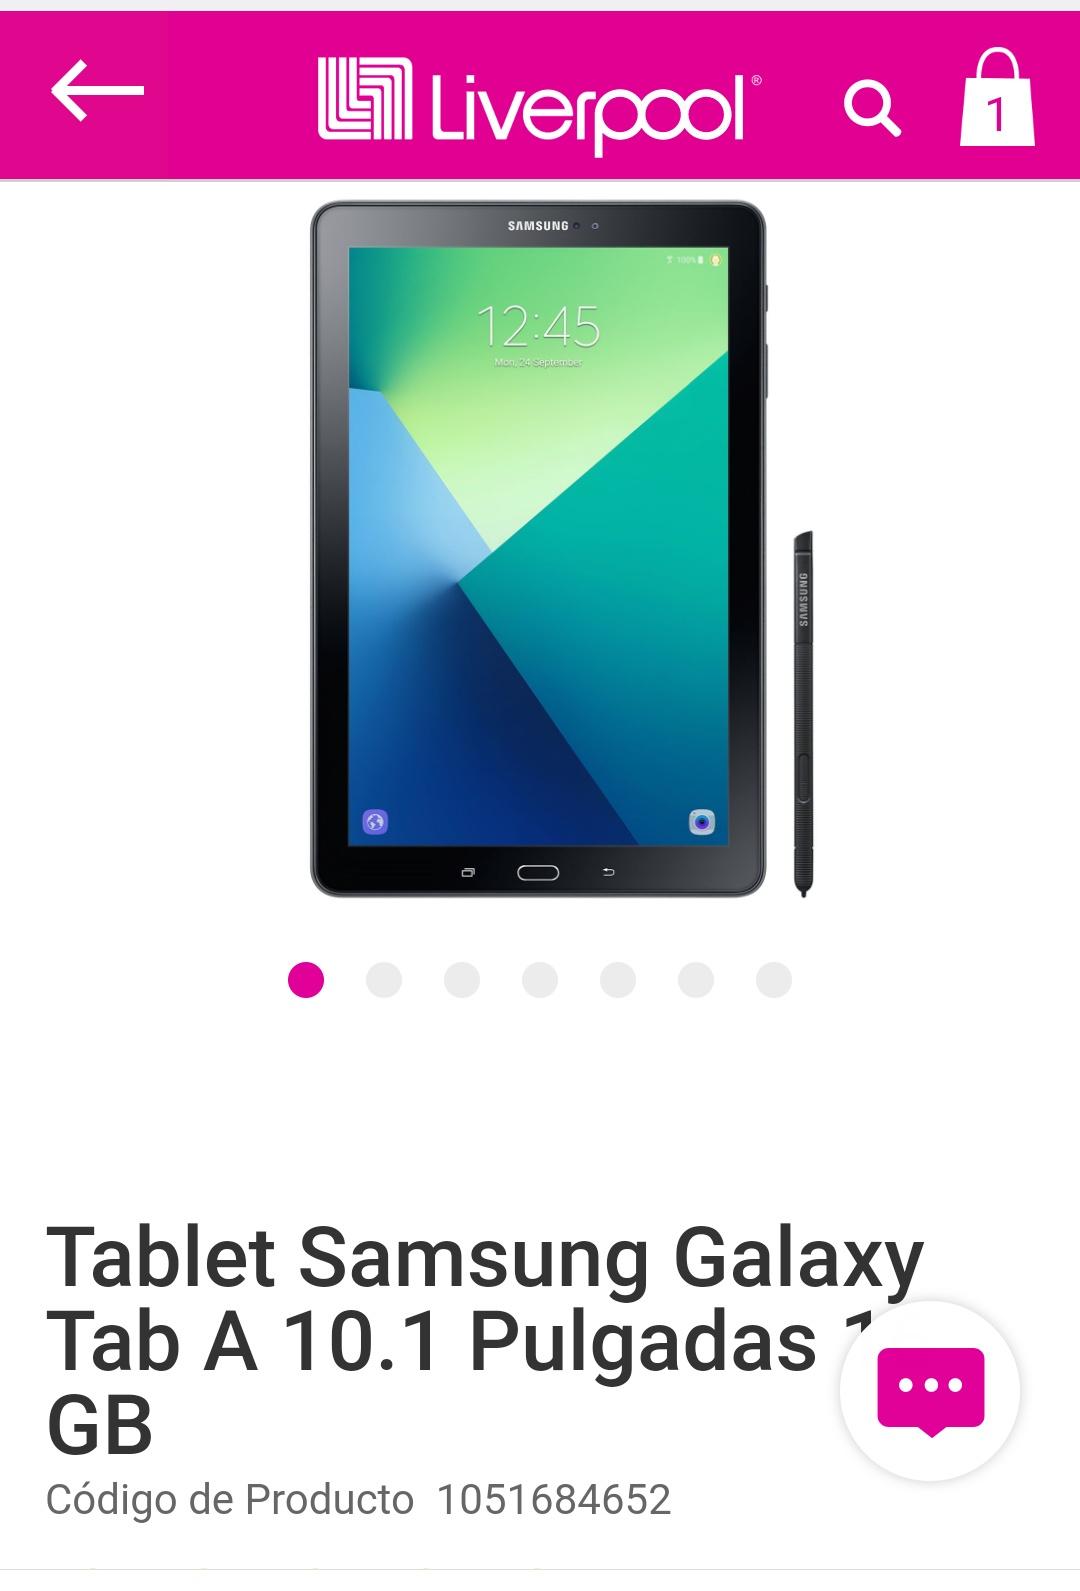 Liverpool: Galaxy Tab A 10 con spen